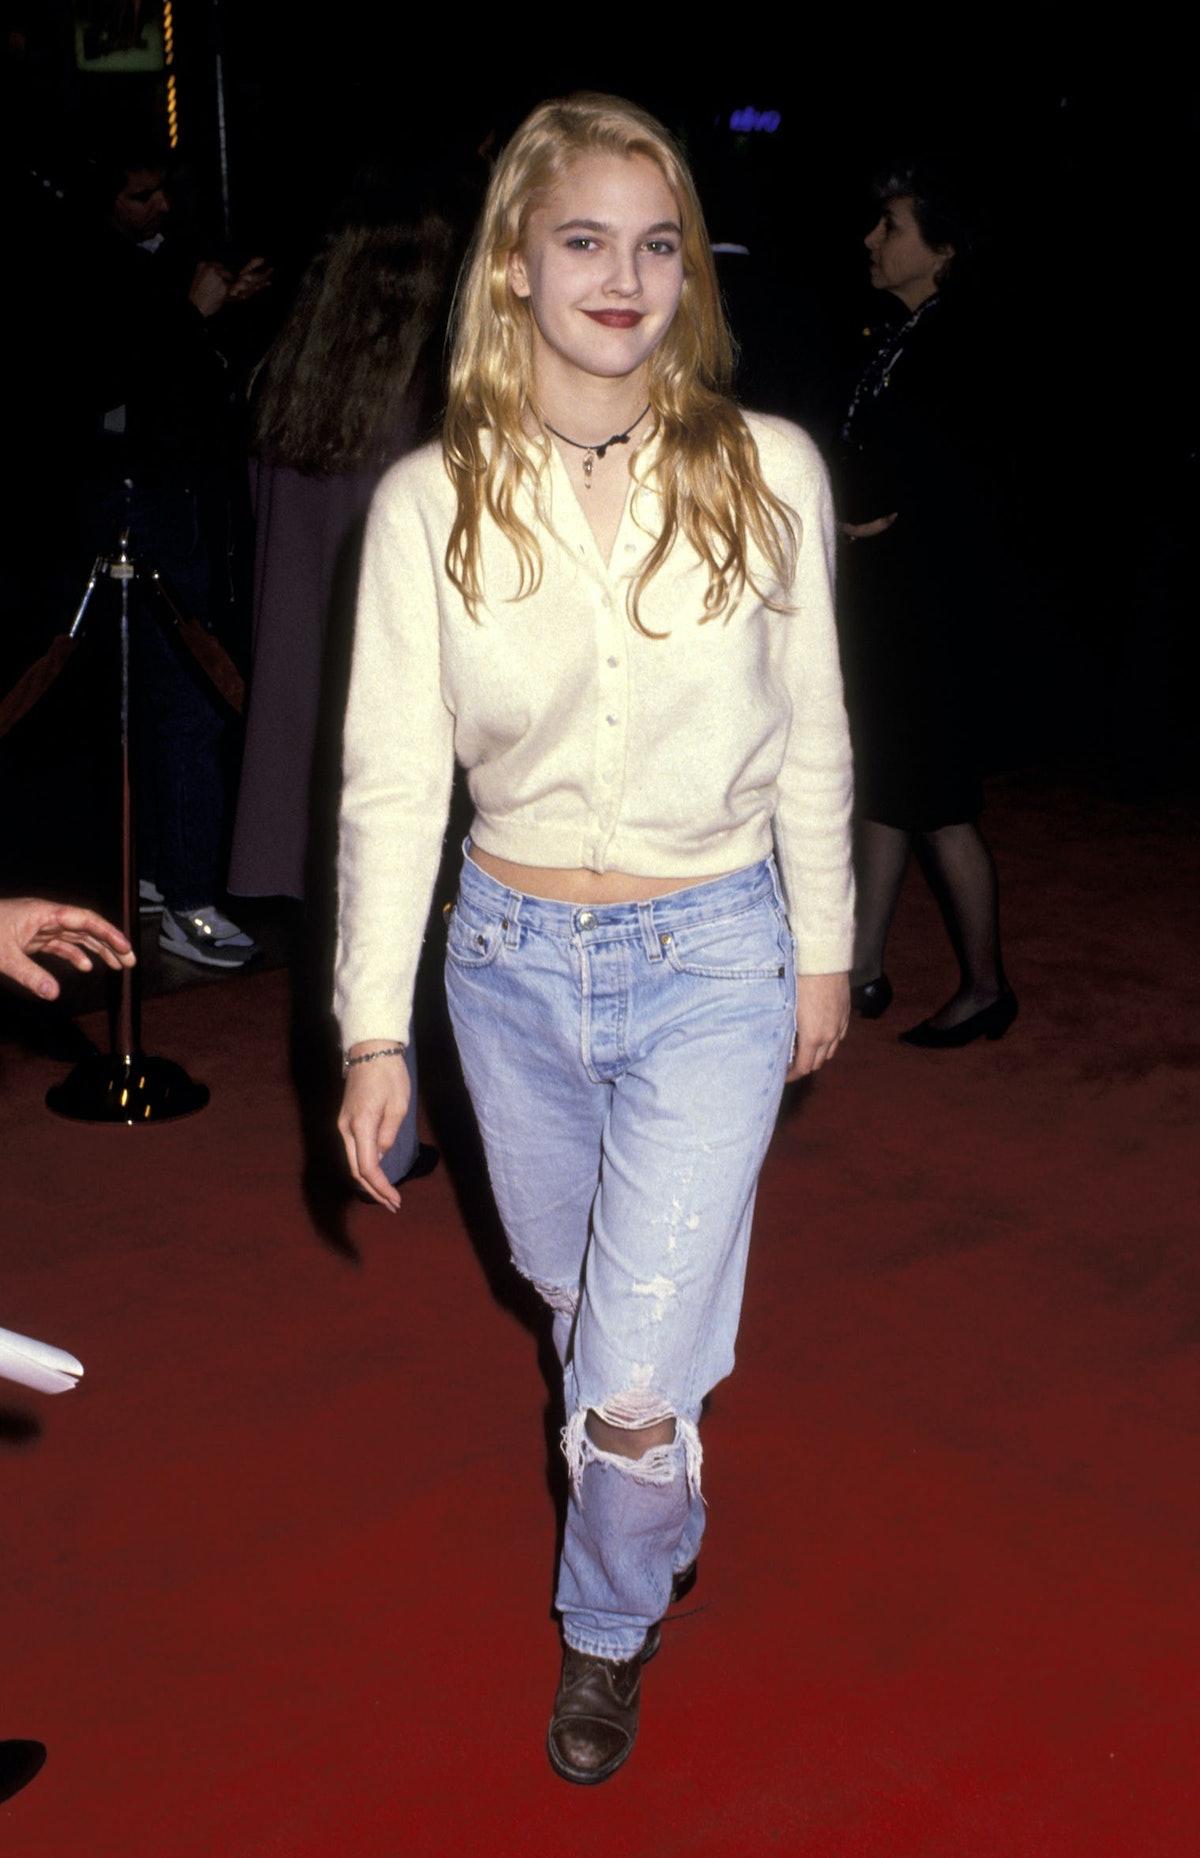 Drew Barrymore wearing jeans in the '90s